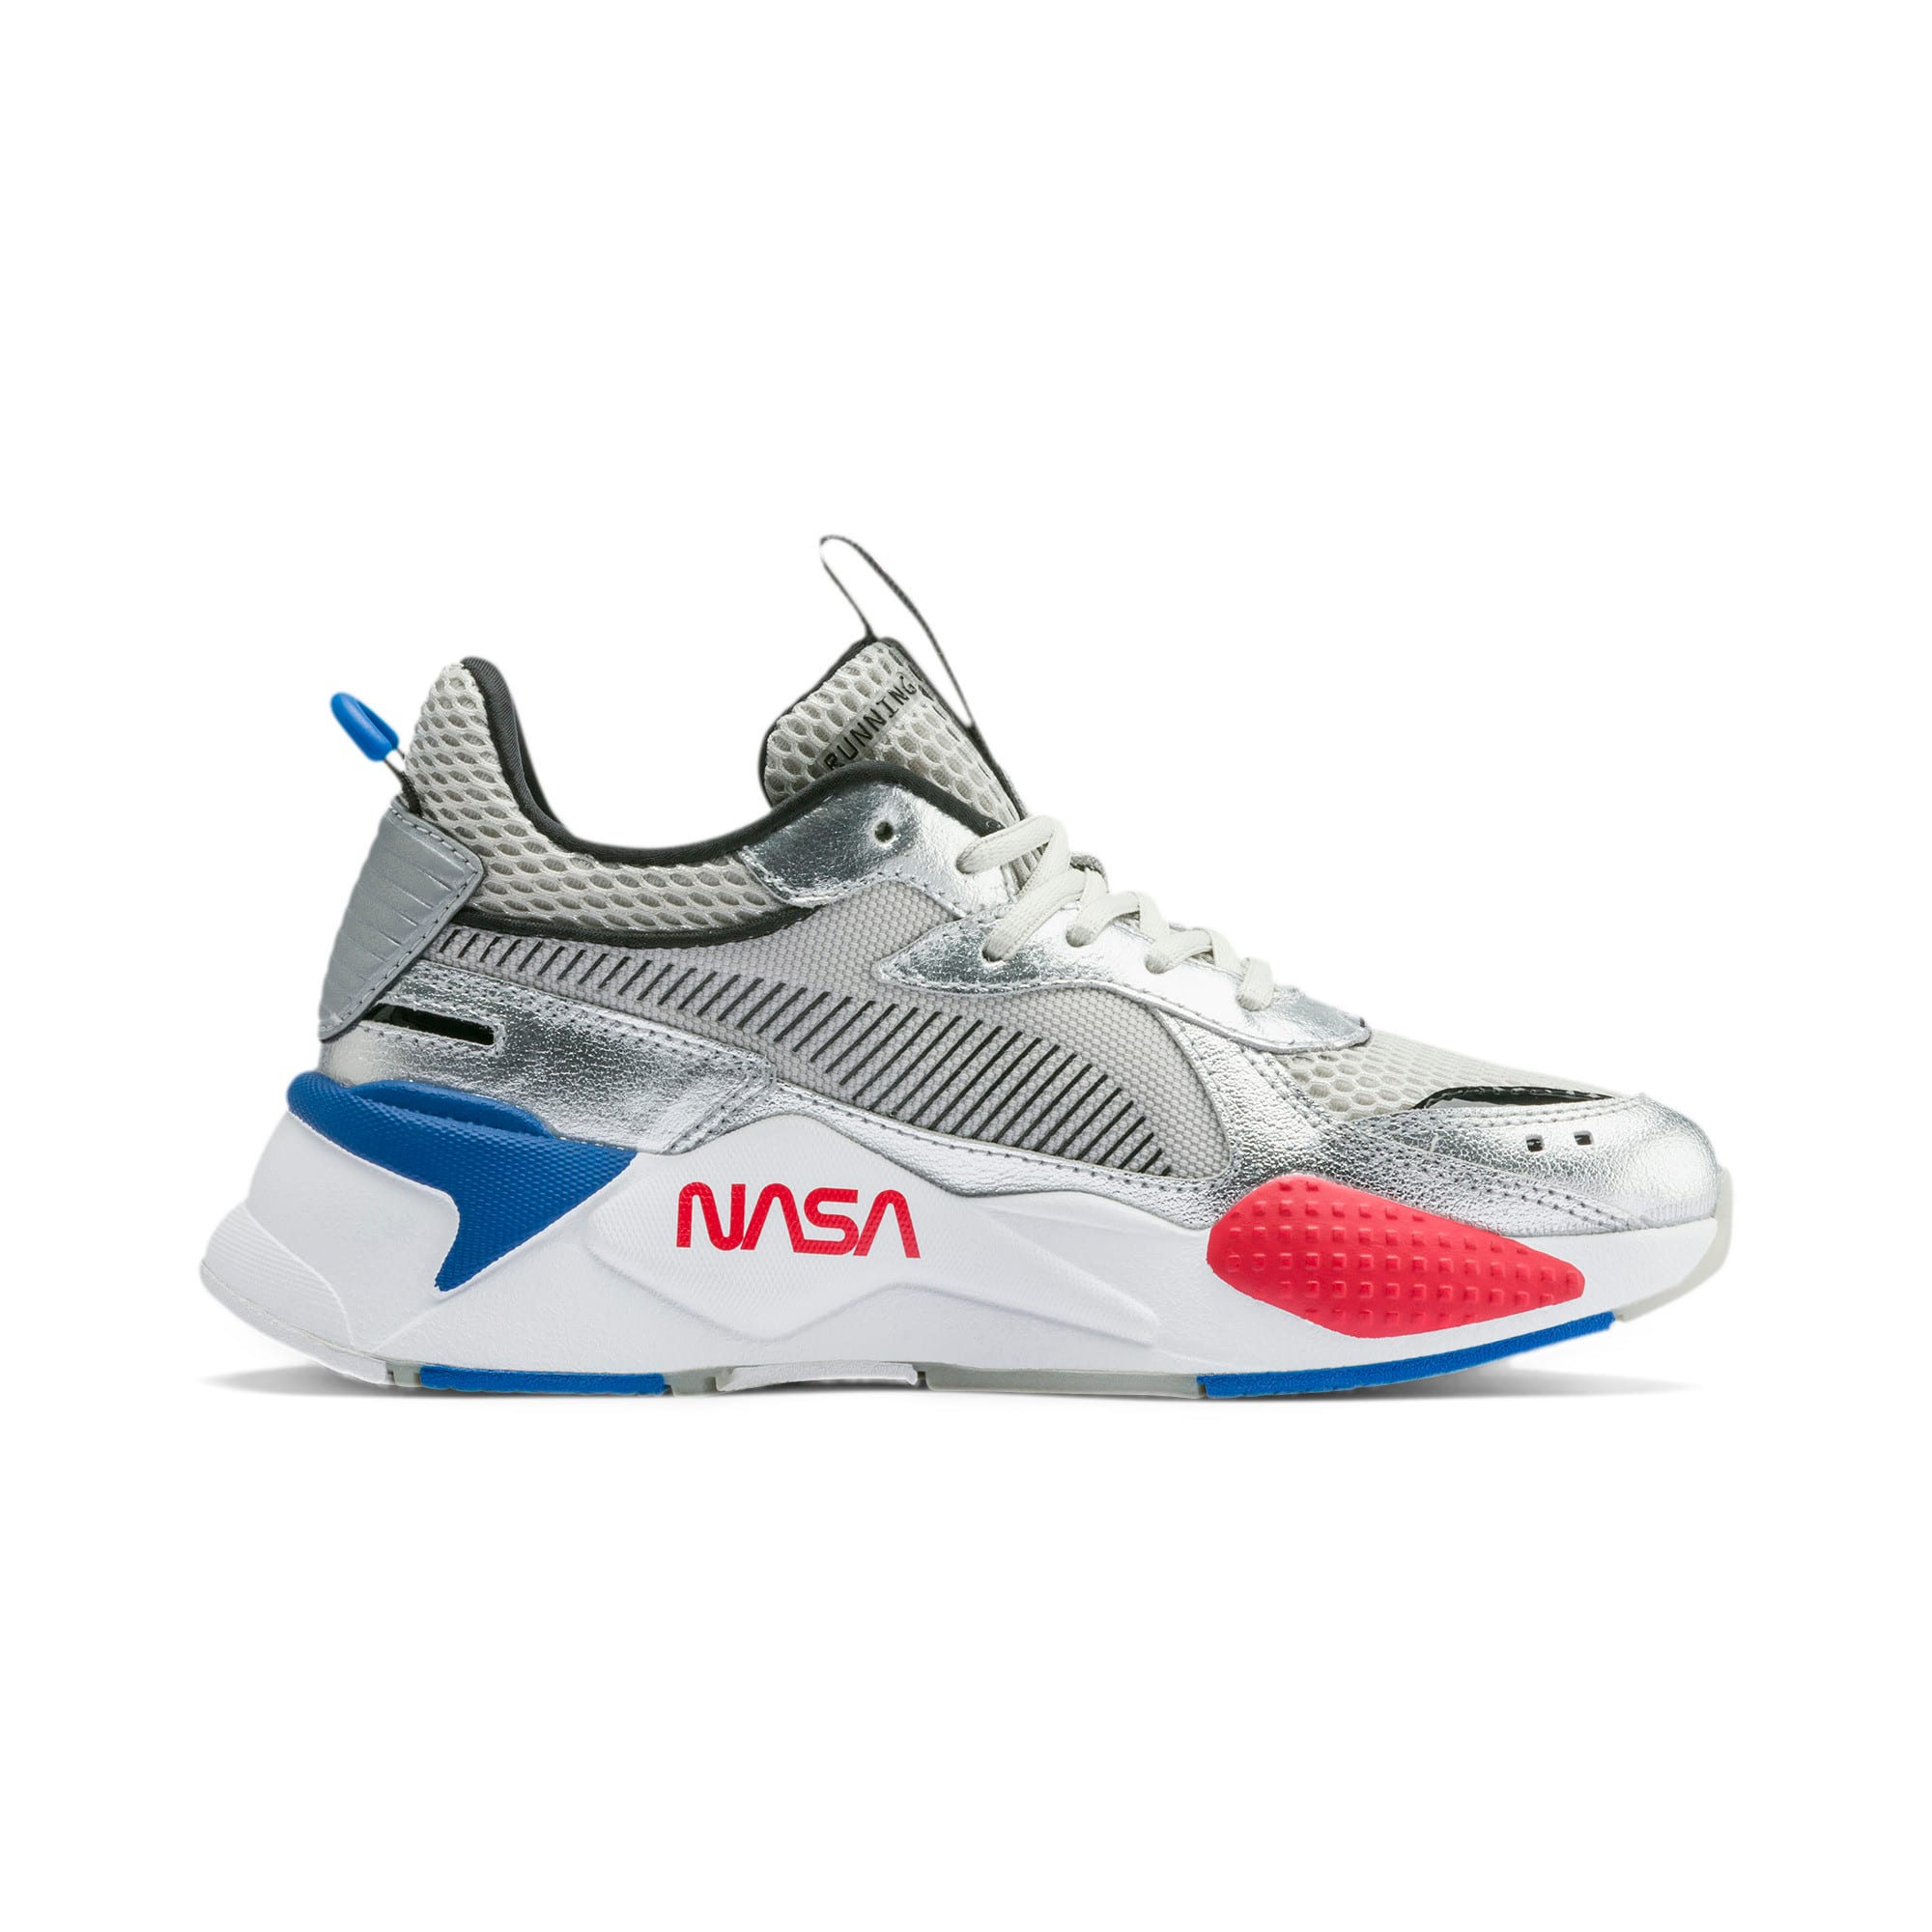 Thumbnail 5 of RS-X Space Agency Sneakers JR, Puma Silver-Gray Violet, medium